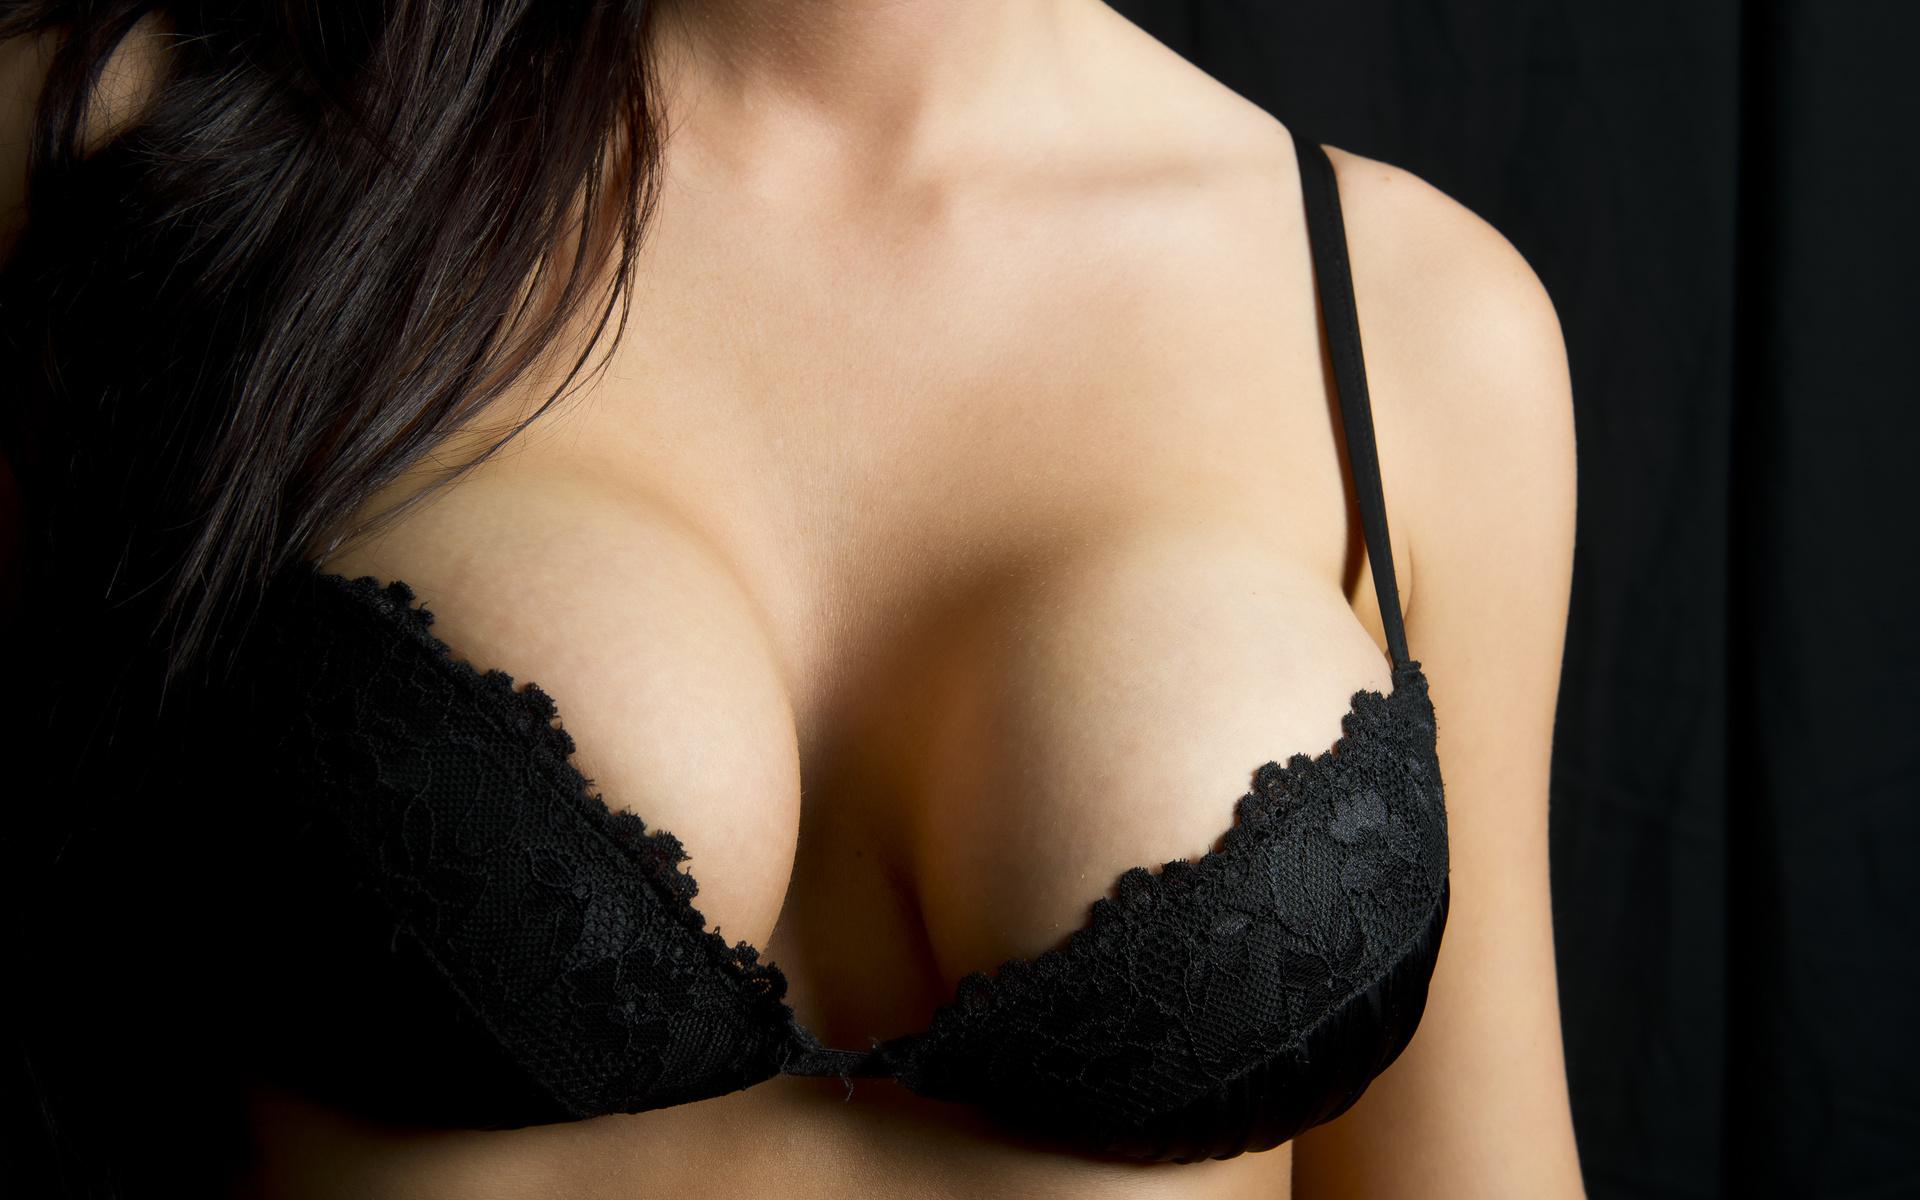 картинки с женским бюстом которых